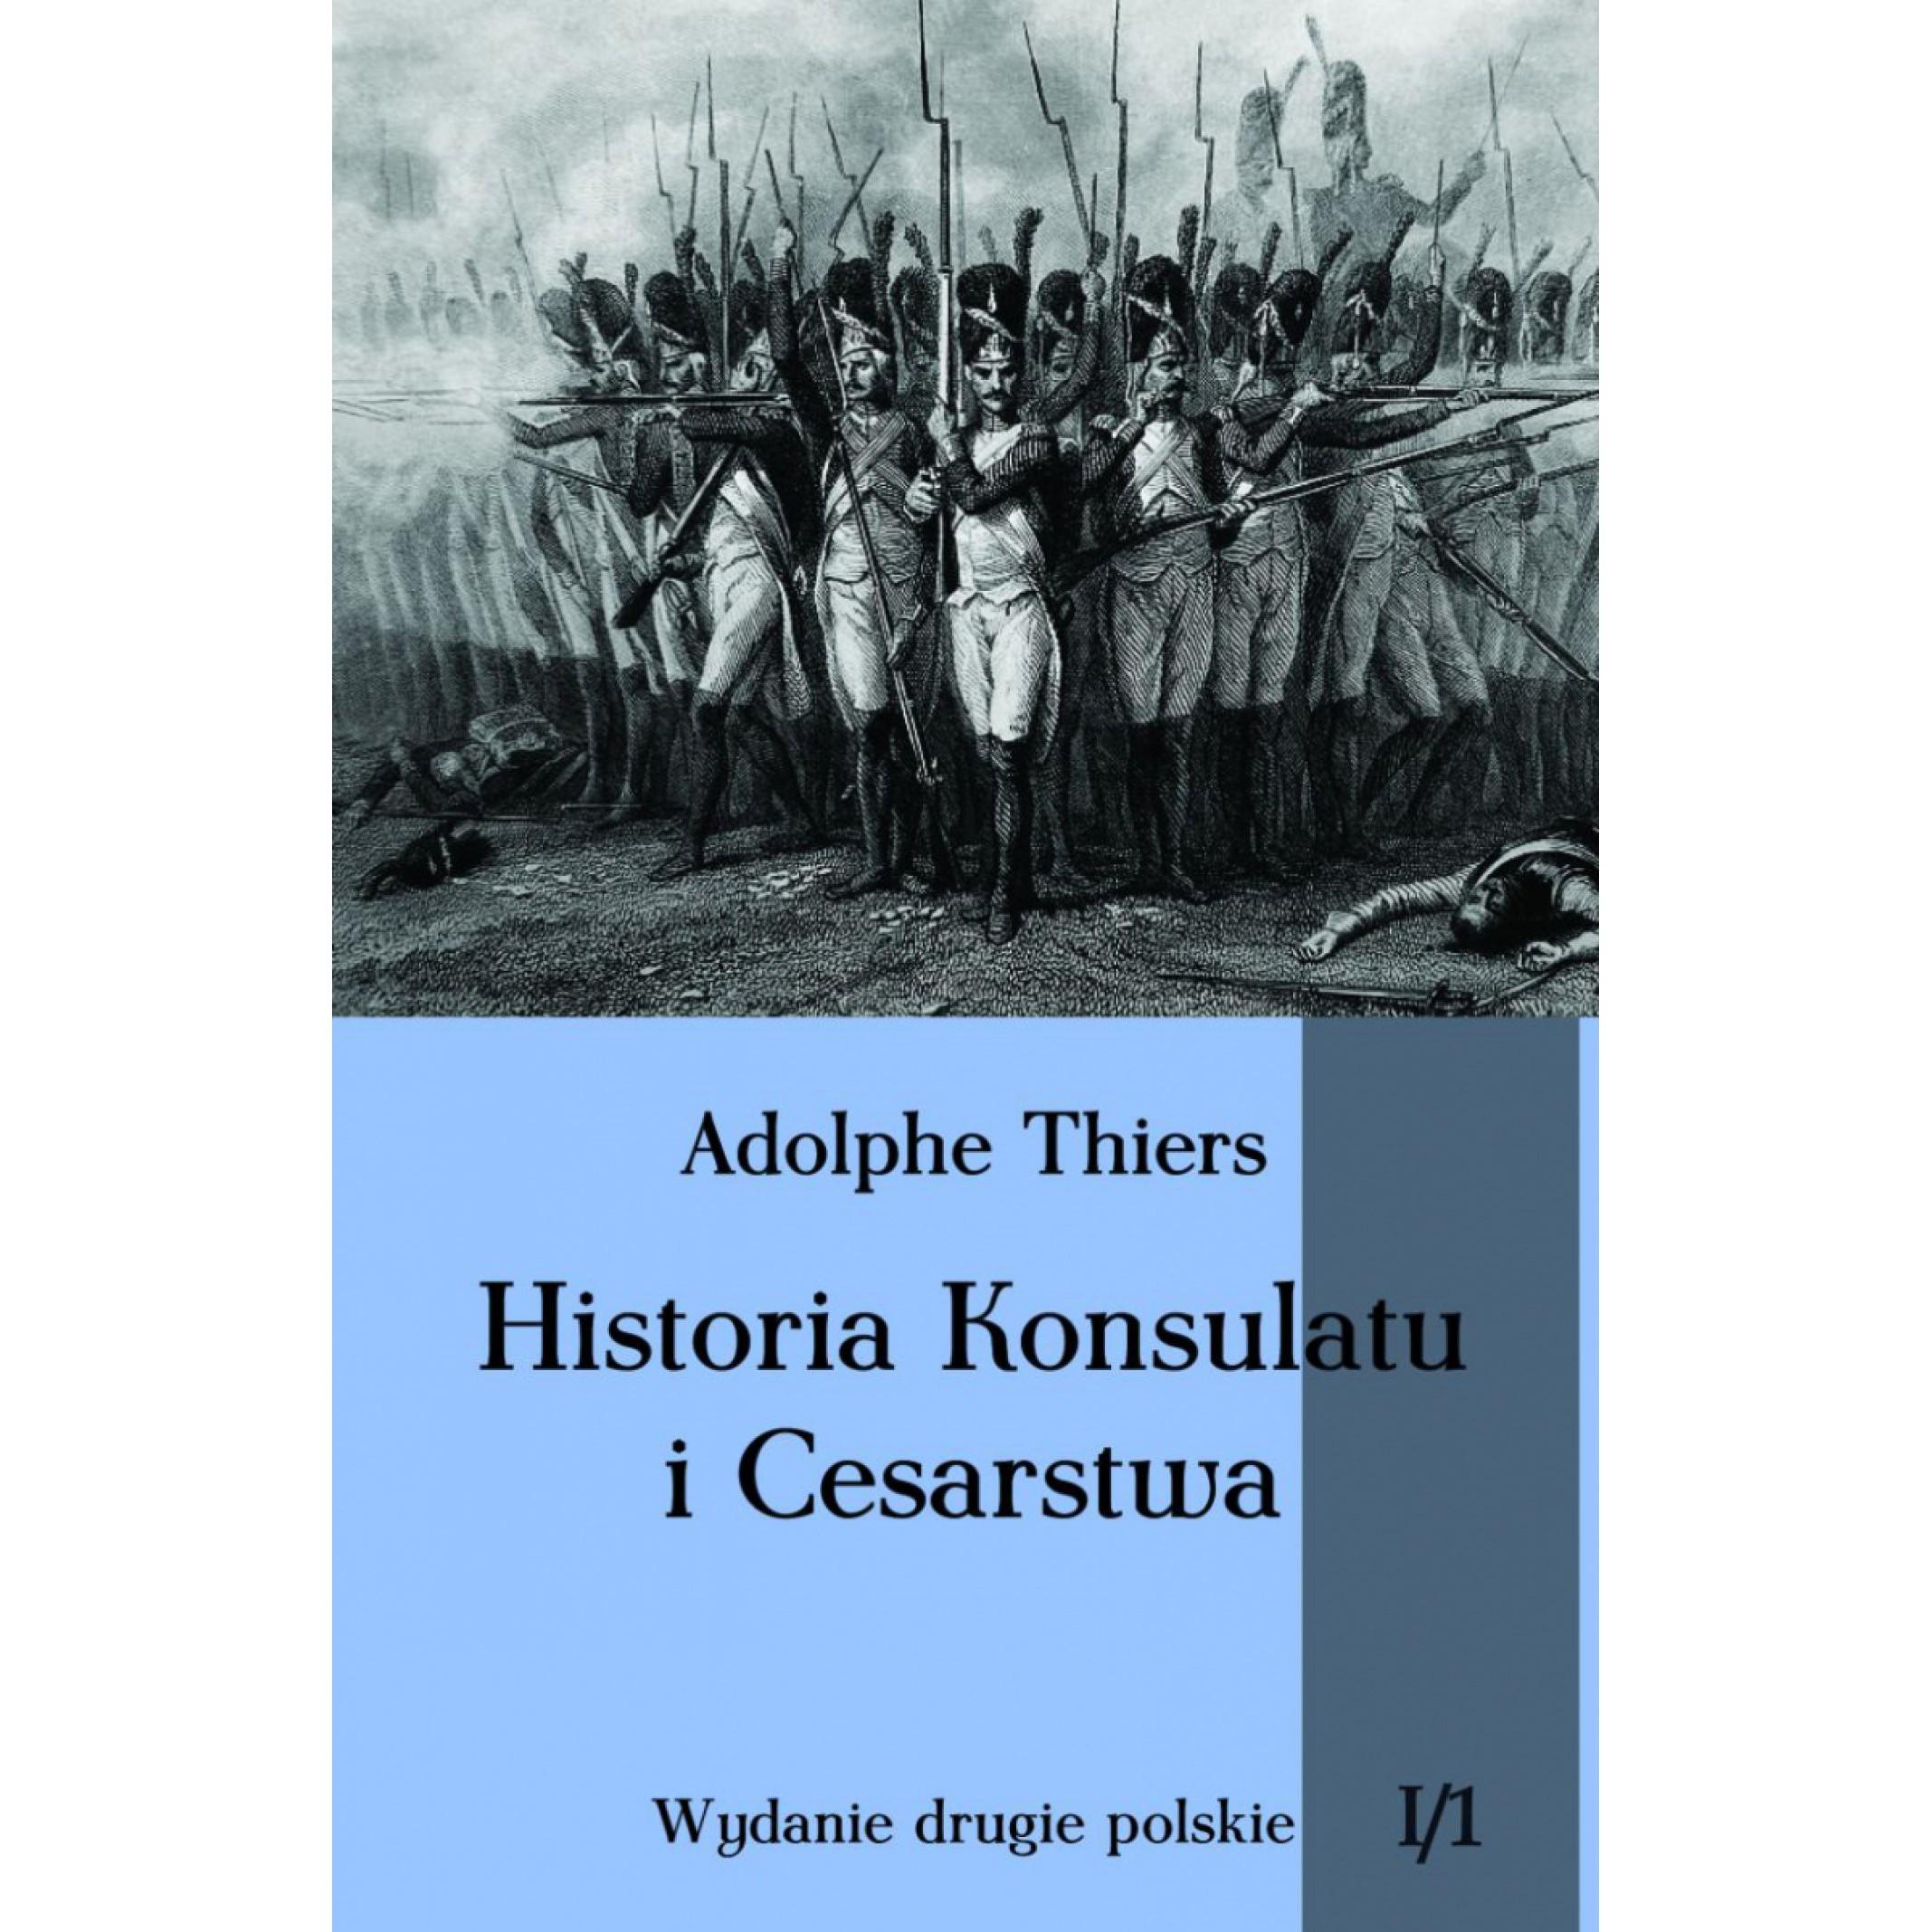 Historia Konsulatu i Cesarstwa tom I cz. 1